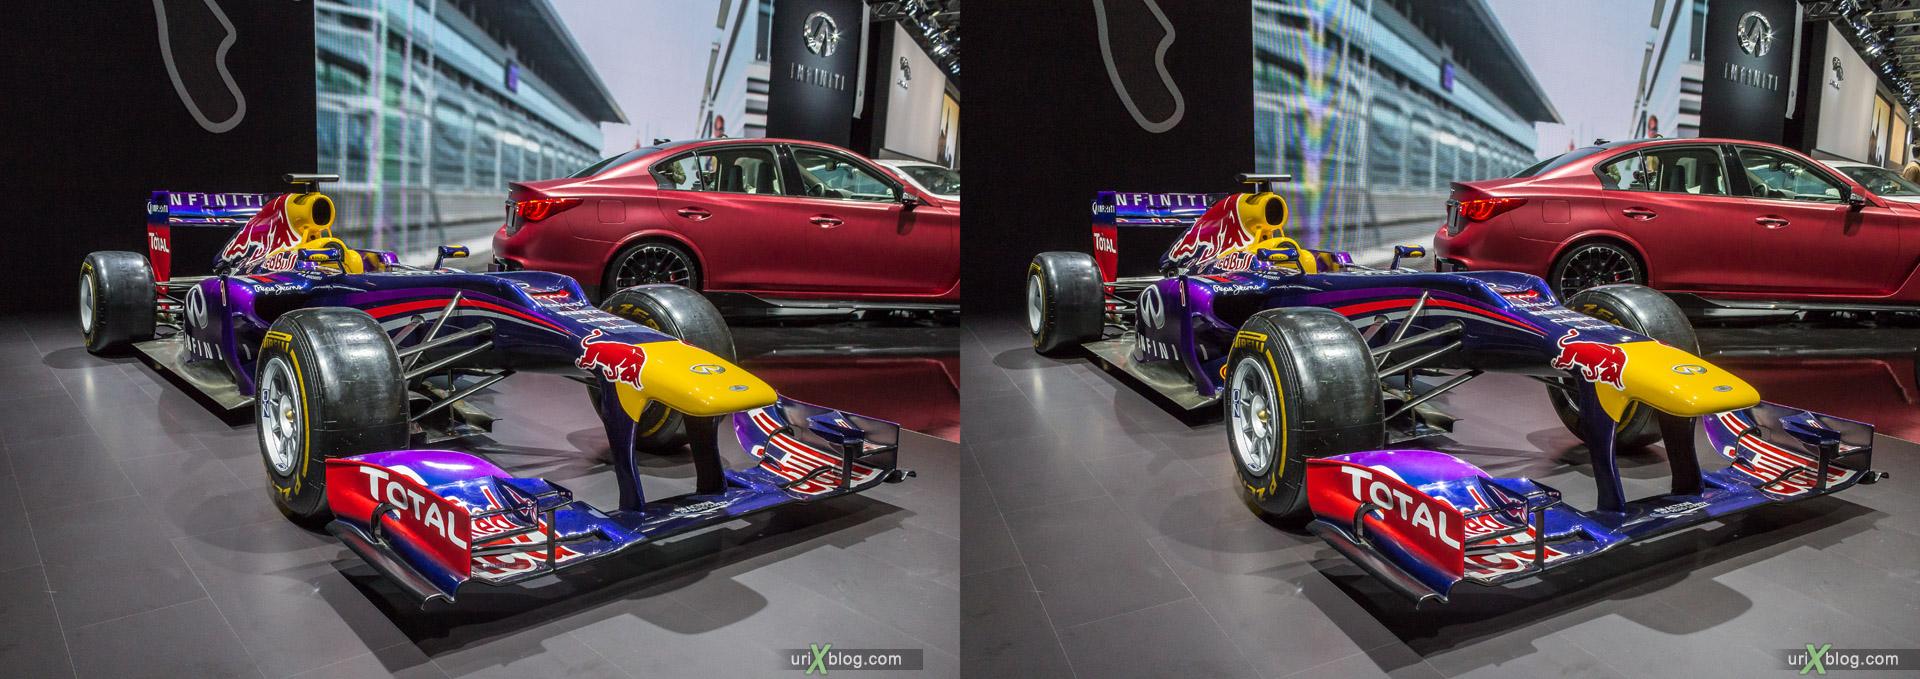 2014, Infiniti, Moscow International Automobile Salon, MIAS, Crocus Expo, Moscow, Russia, augest, 3D, stereo pair, cross-eyed, crossview, cross view stereo pair, stereoscopic